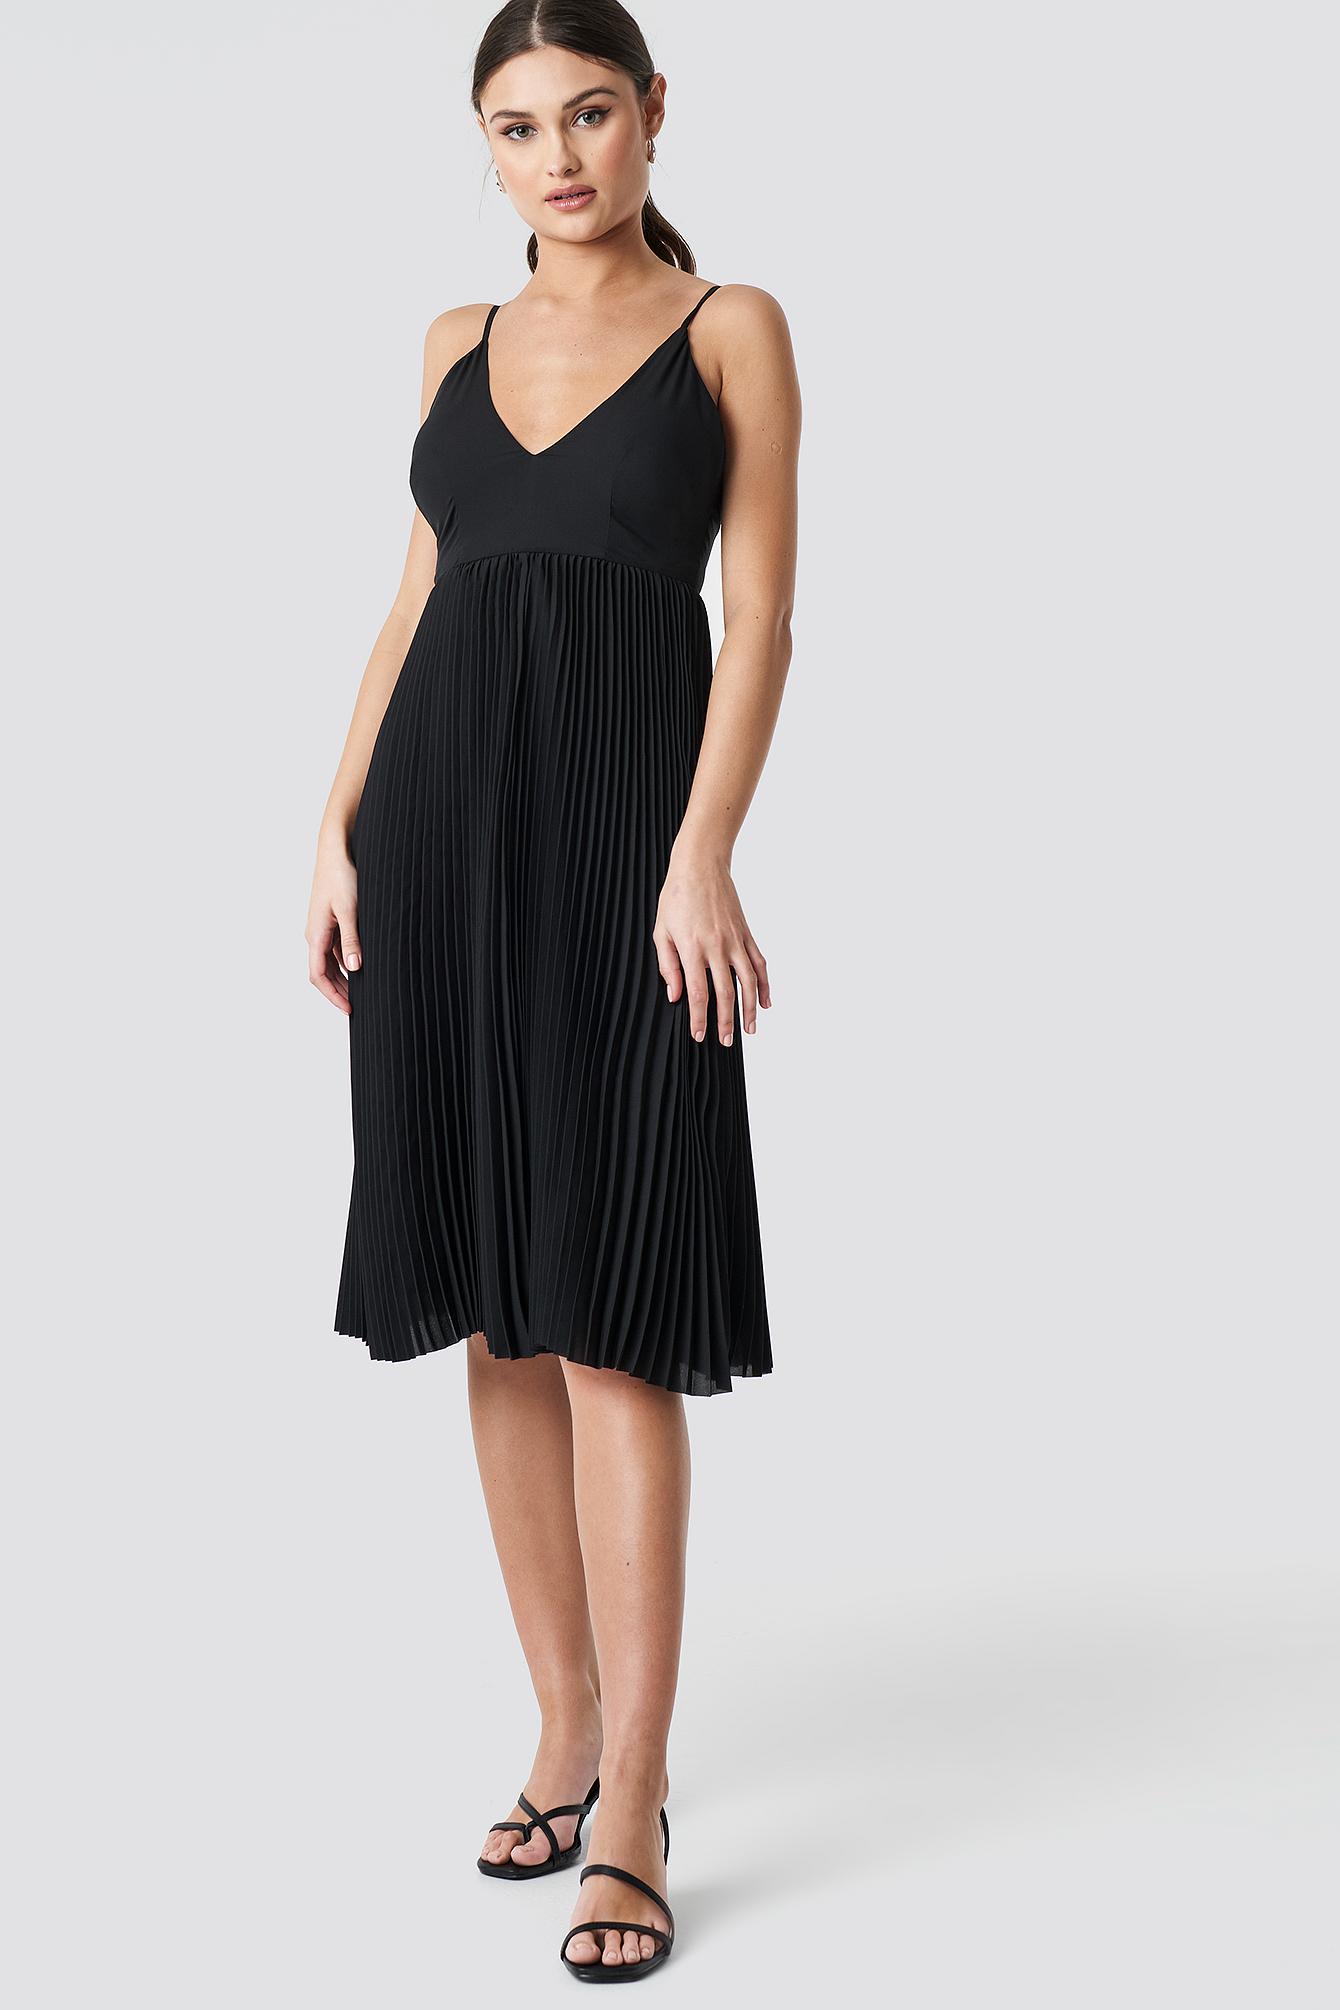 Thin Strap Deep V-Neck Dress NA-KD.COM